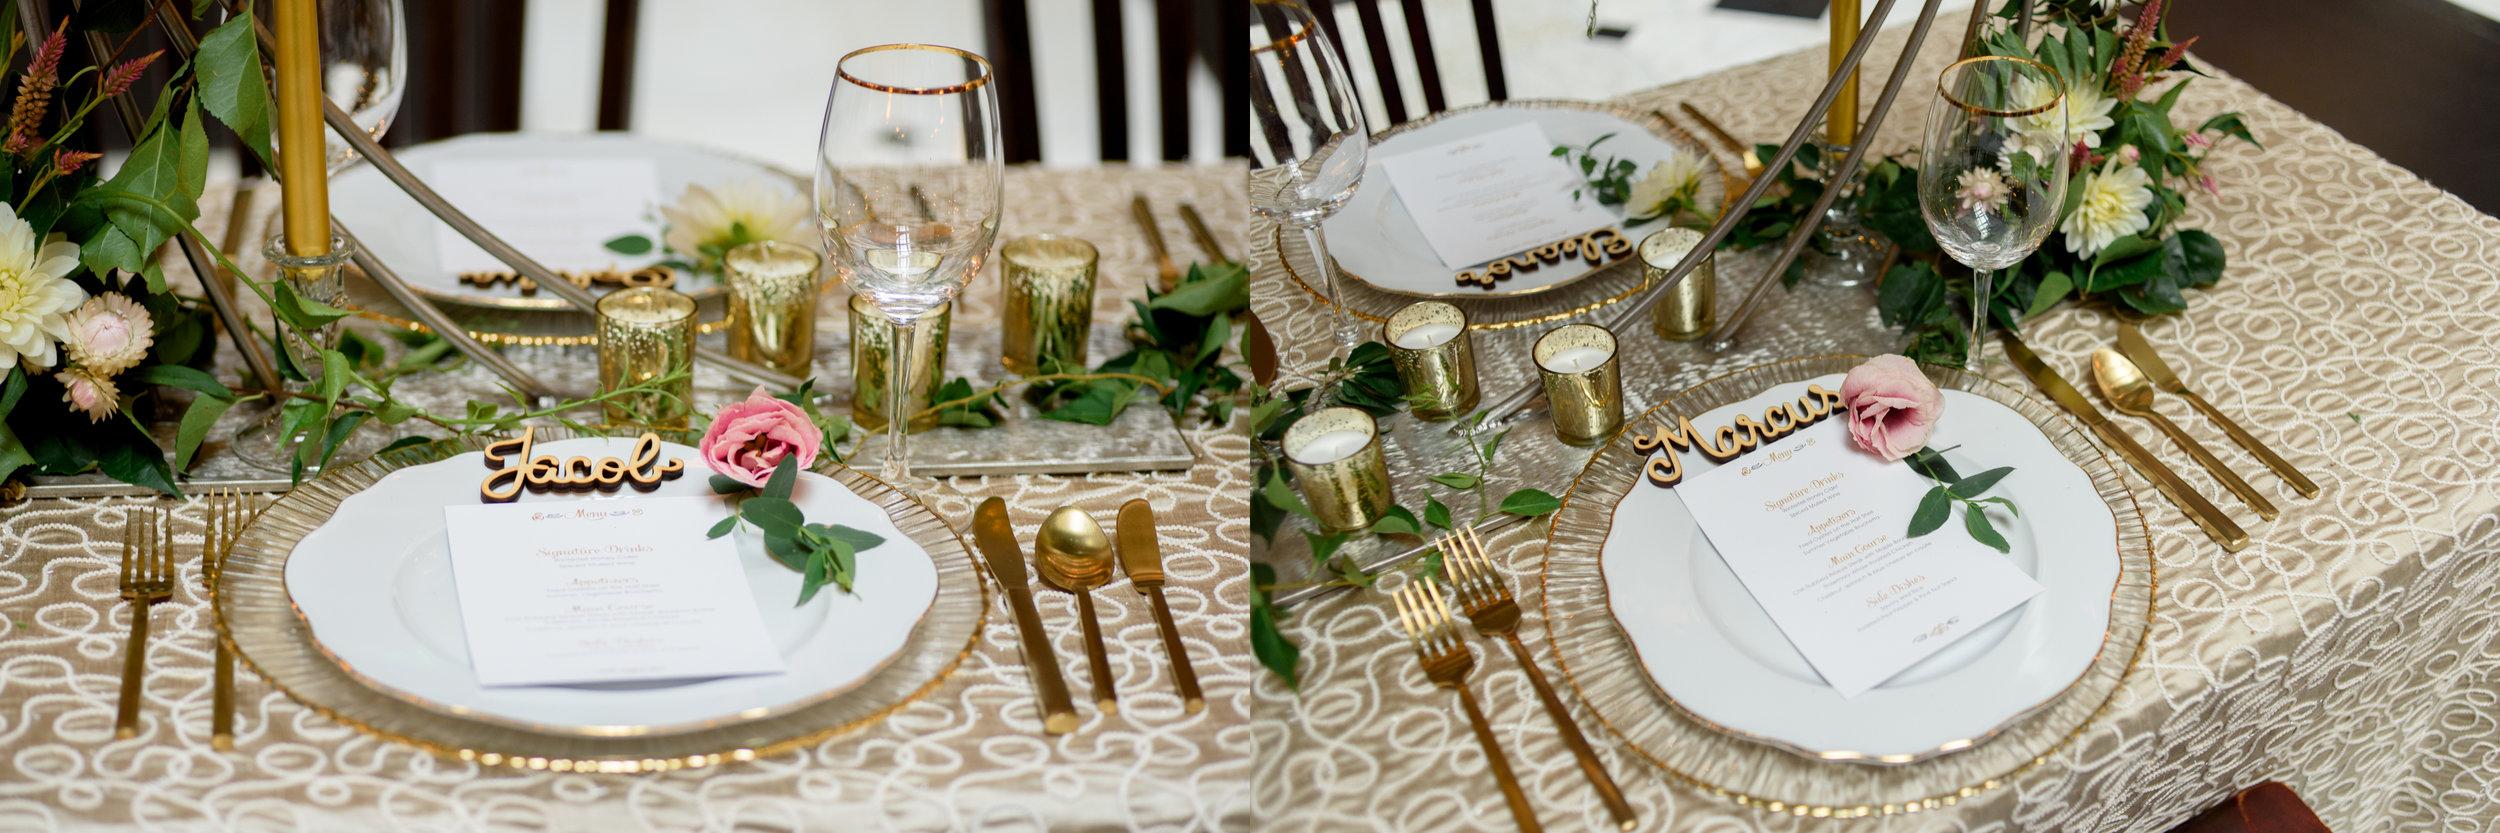 George_Peabody_Library-Wedding_Styled_Shoot-29.jpg